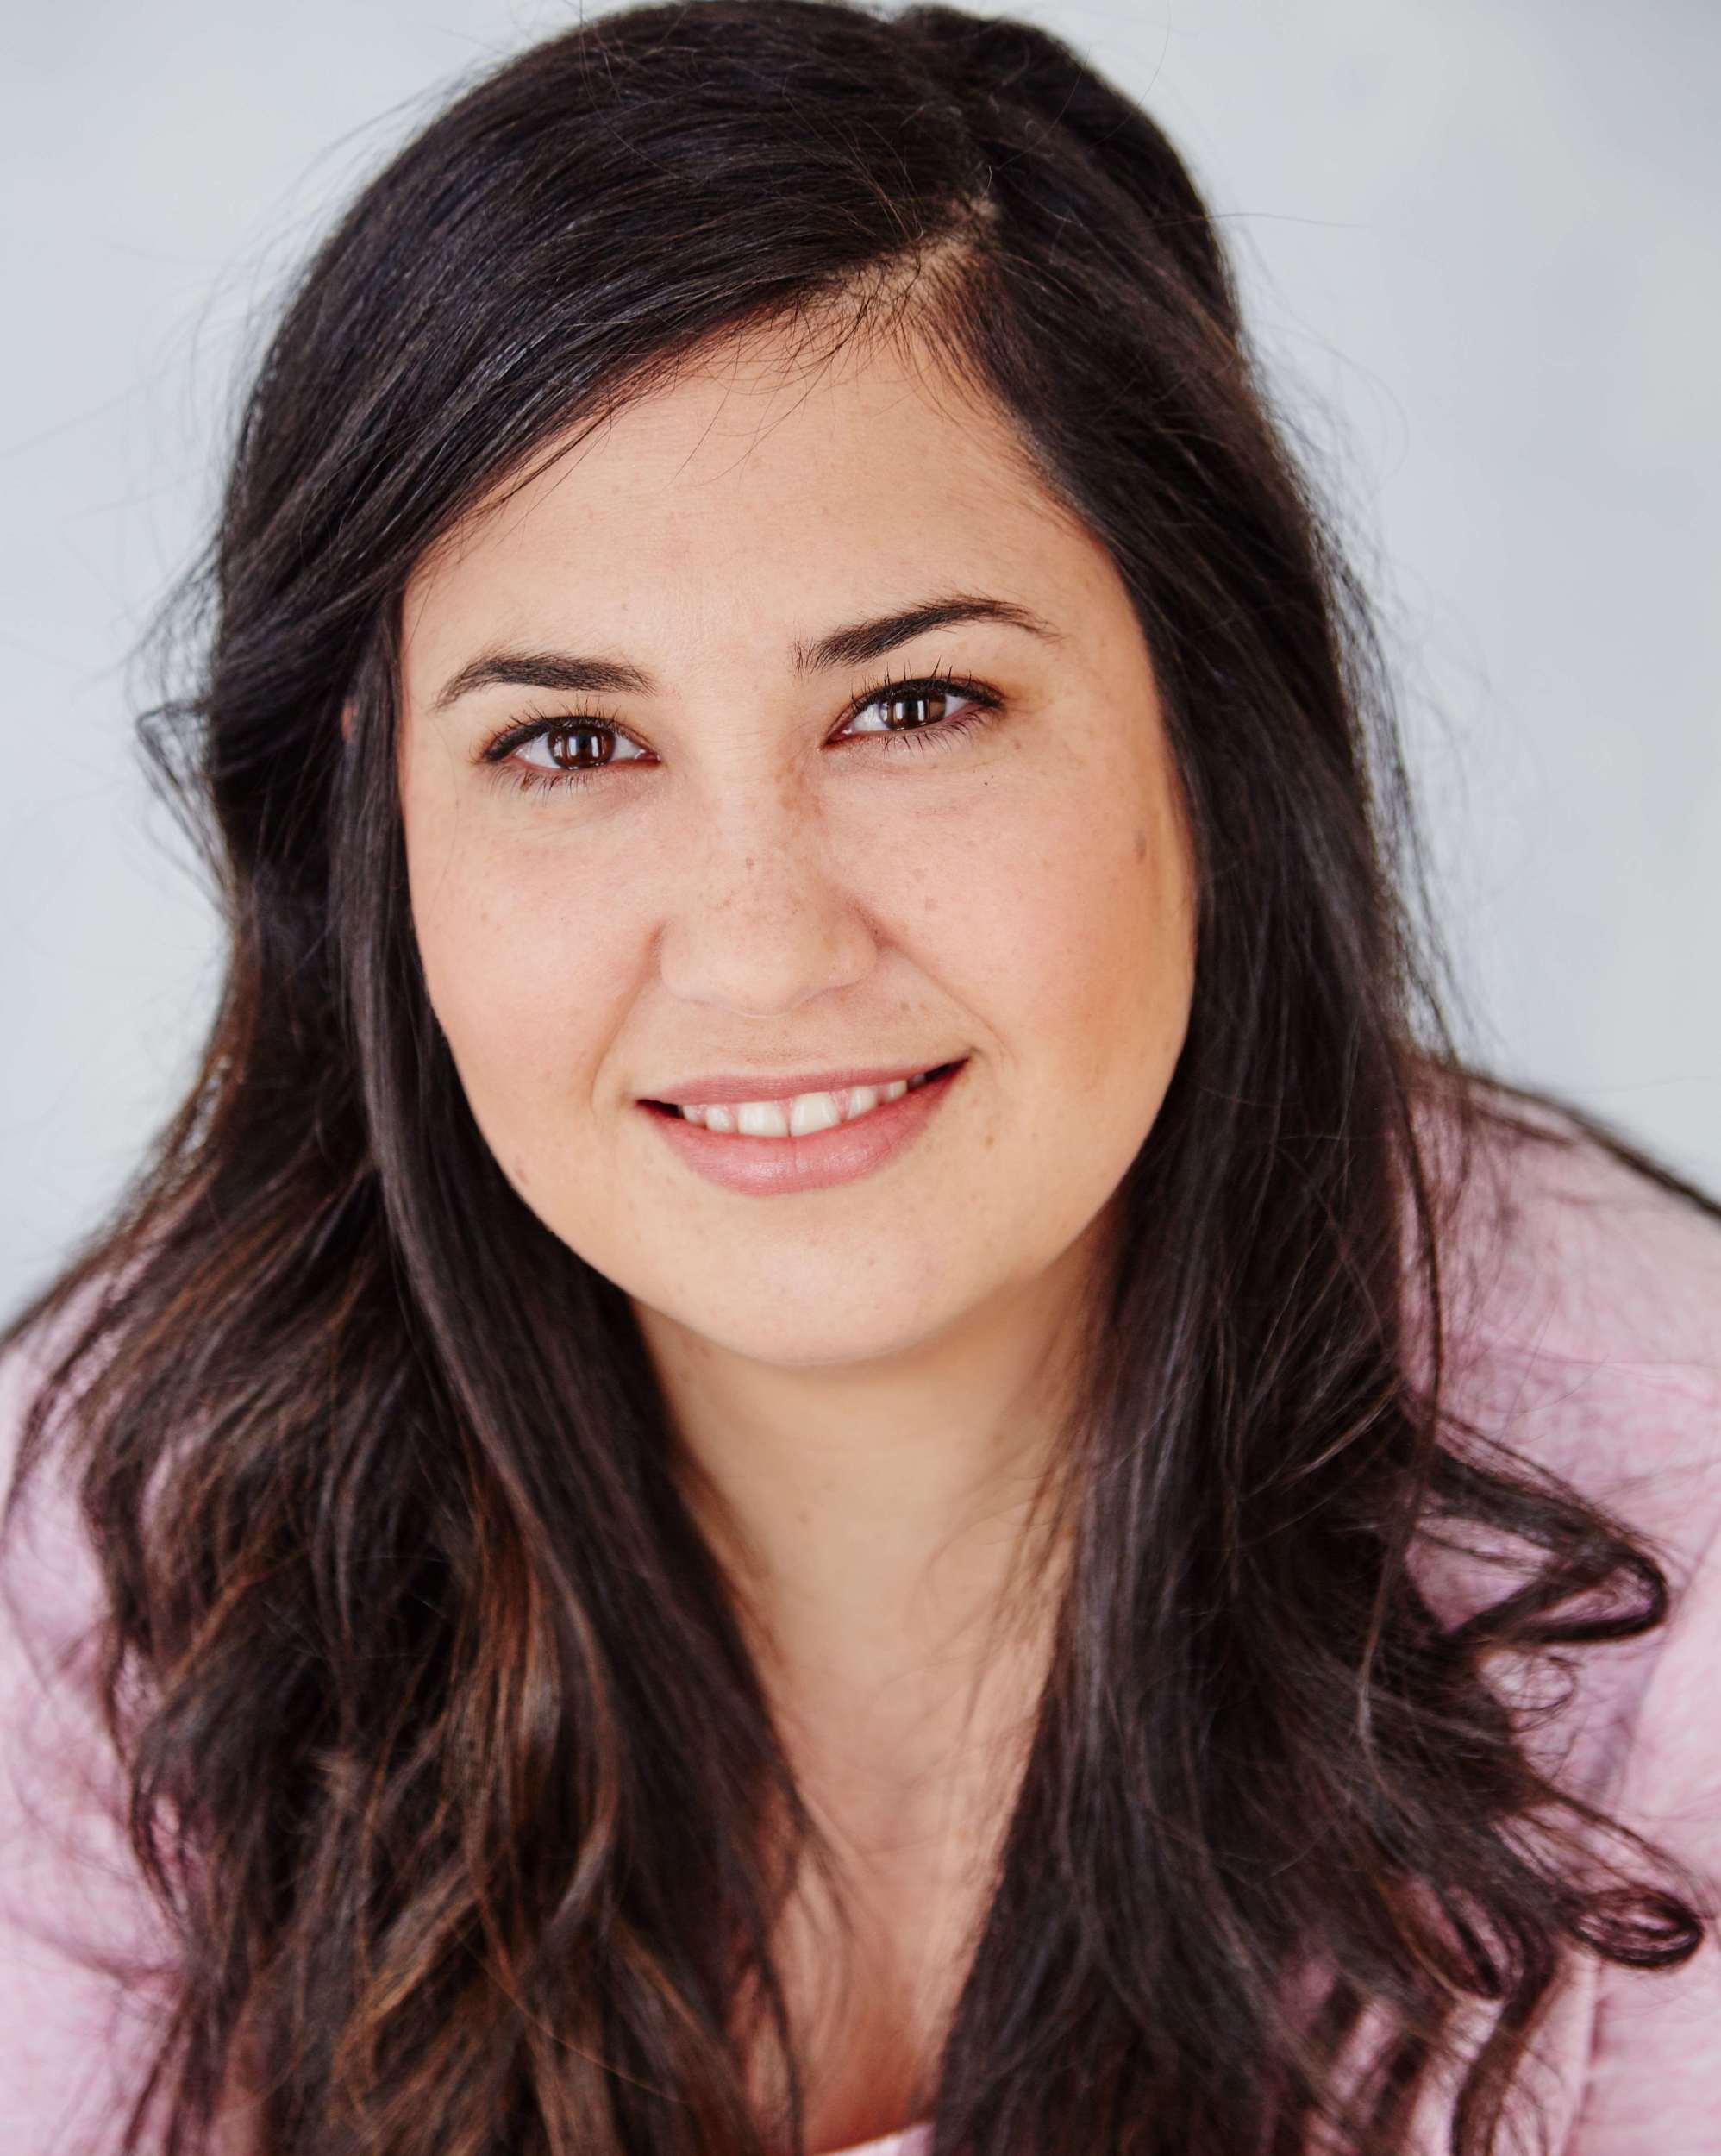 Tricia Morosin